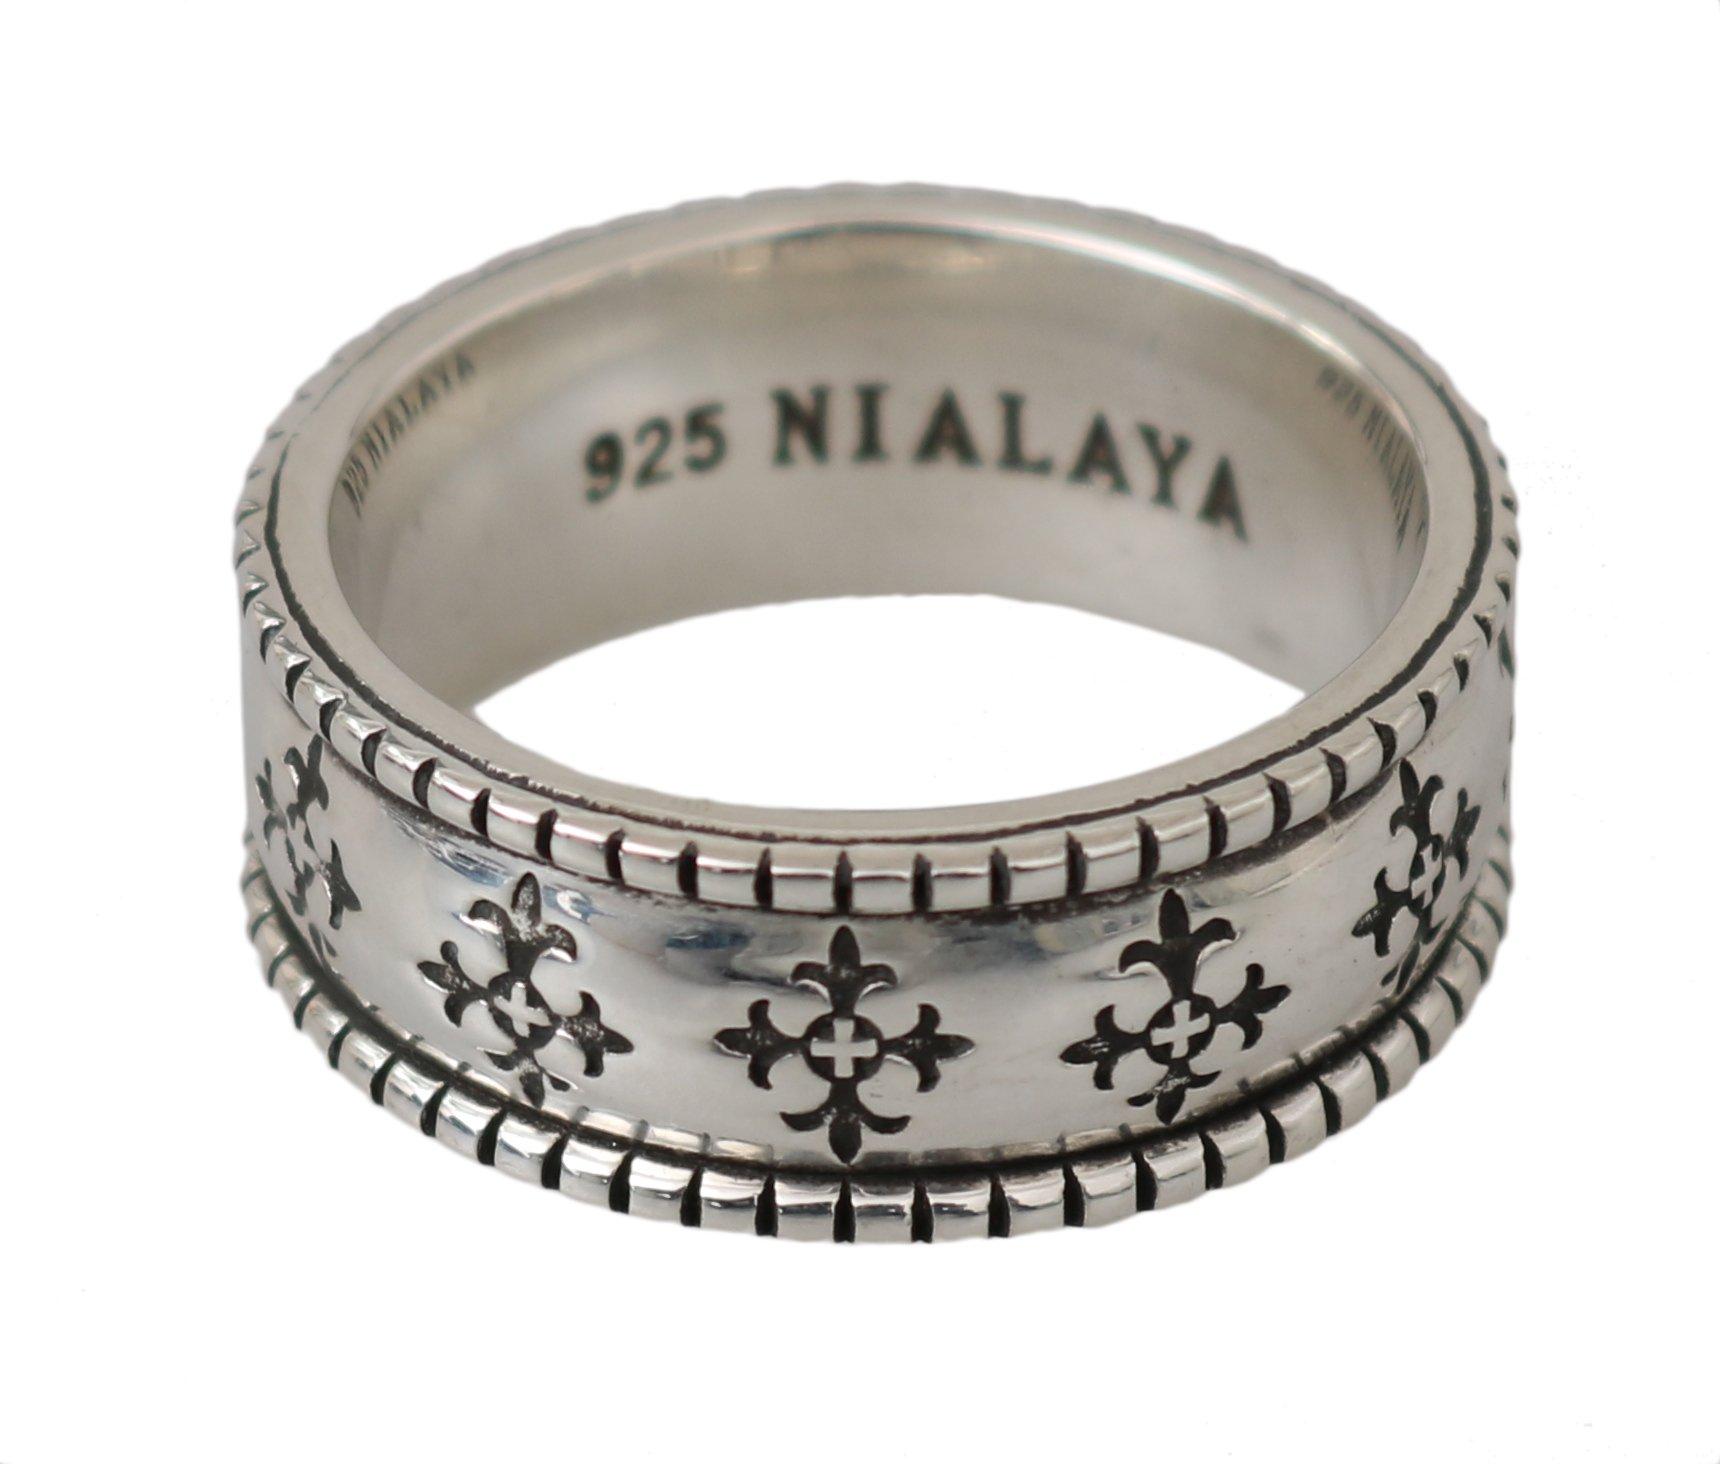 Nialaya Men's Sterling Cross Logo Authentic 925 Ring Silver NY101 - EU66 | US12